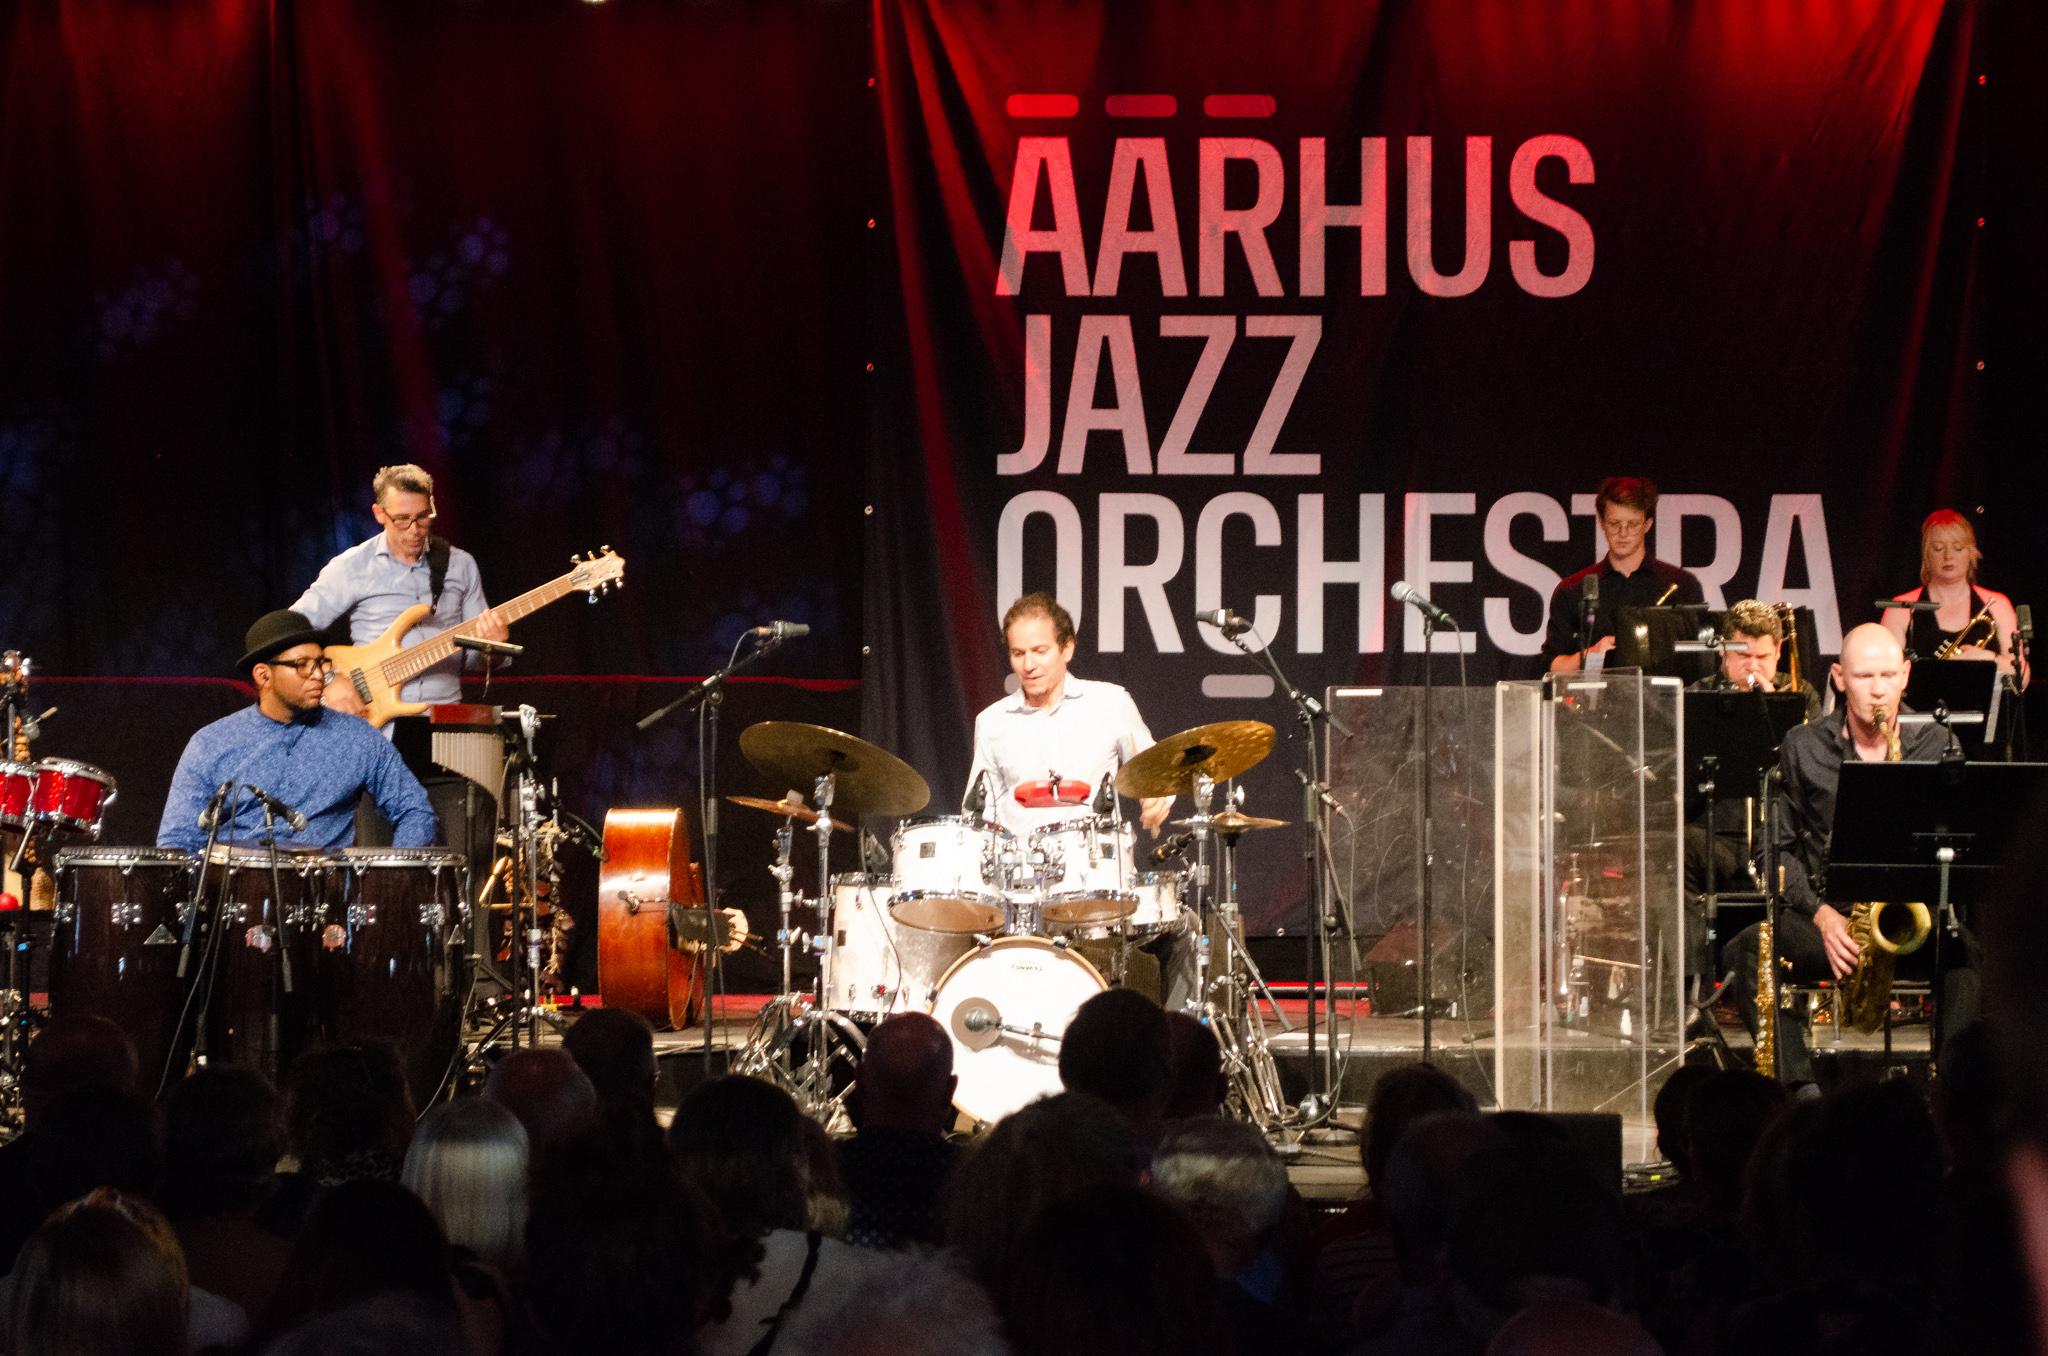 Aarhus Jazz Orchestra & Dafnis Prieto feat. Eliel Lazo & Yasser Pino. Ridehuset Swinger 2019 - Cuban Big Band Nights. Foto: Morten Corfitz Eriksen.